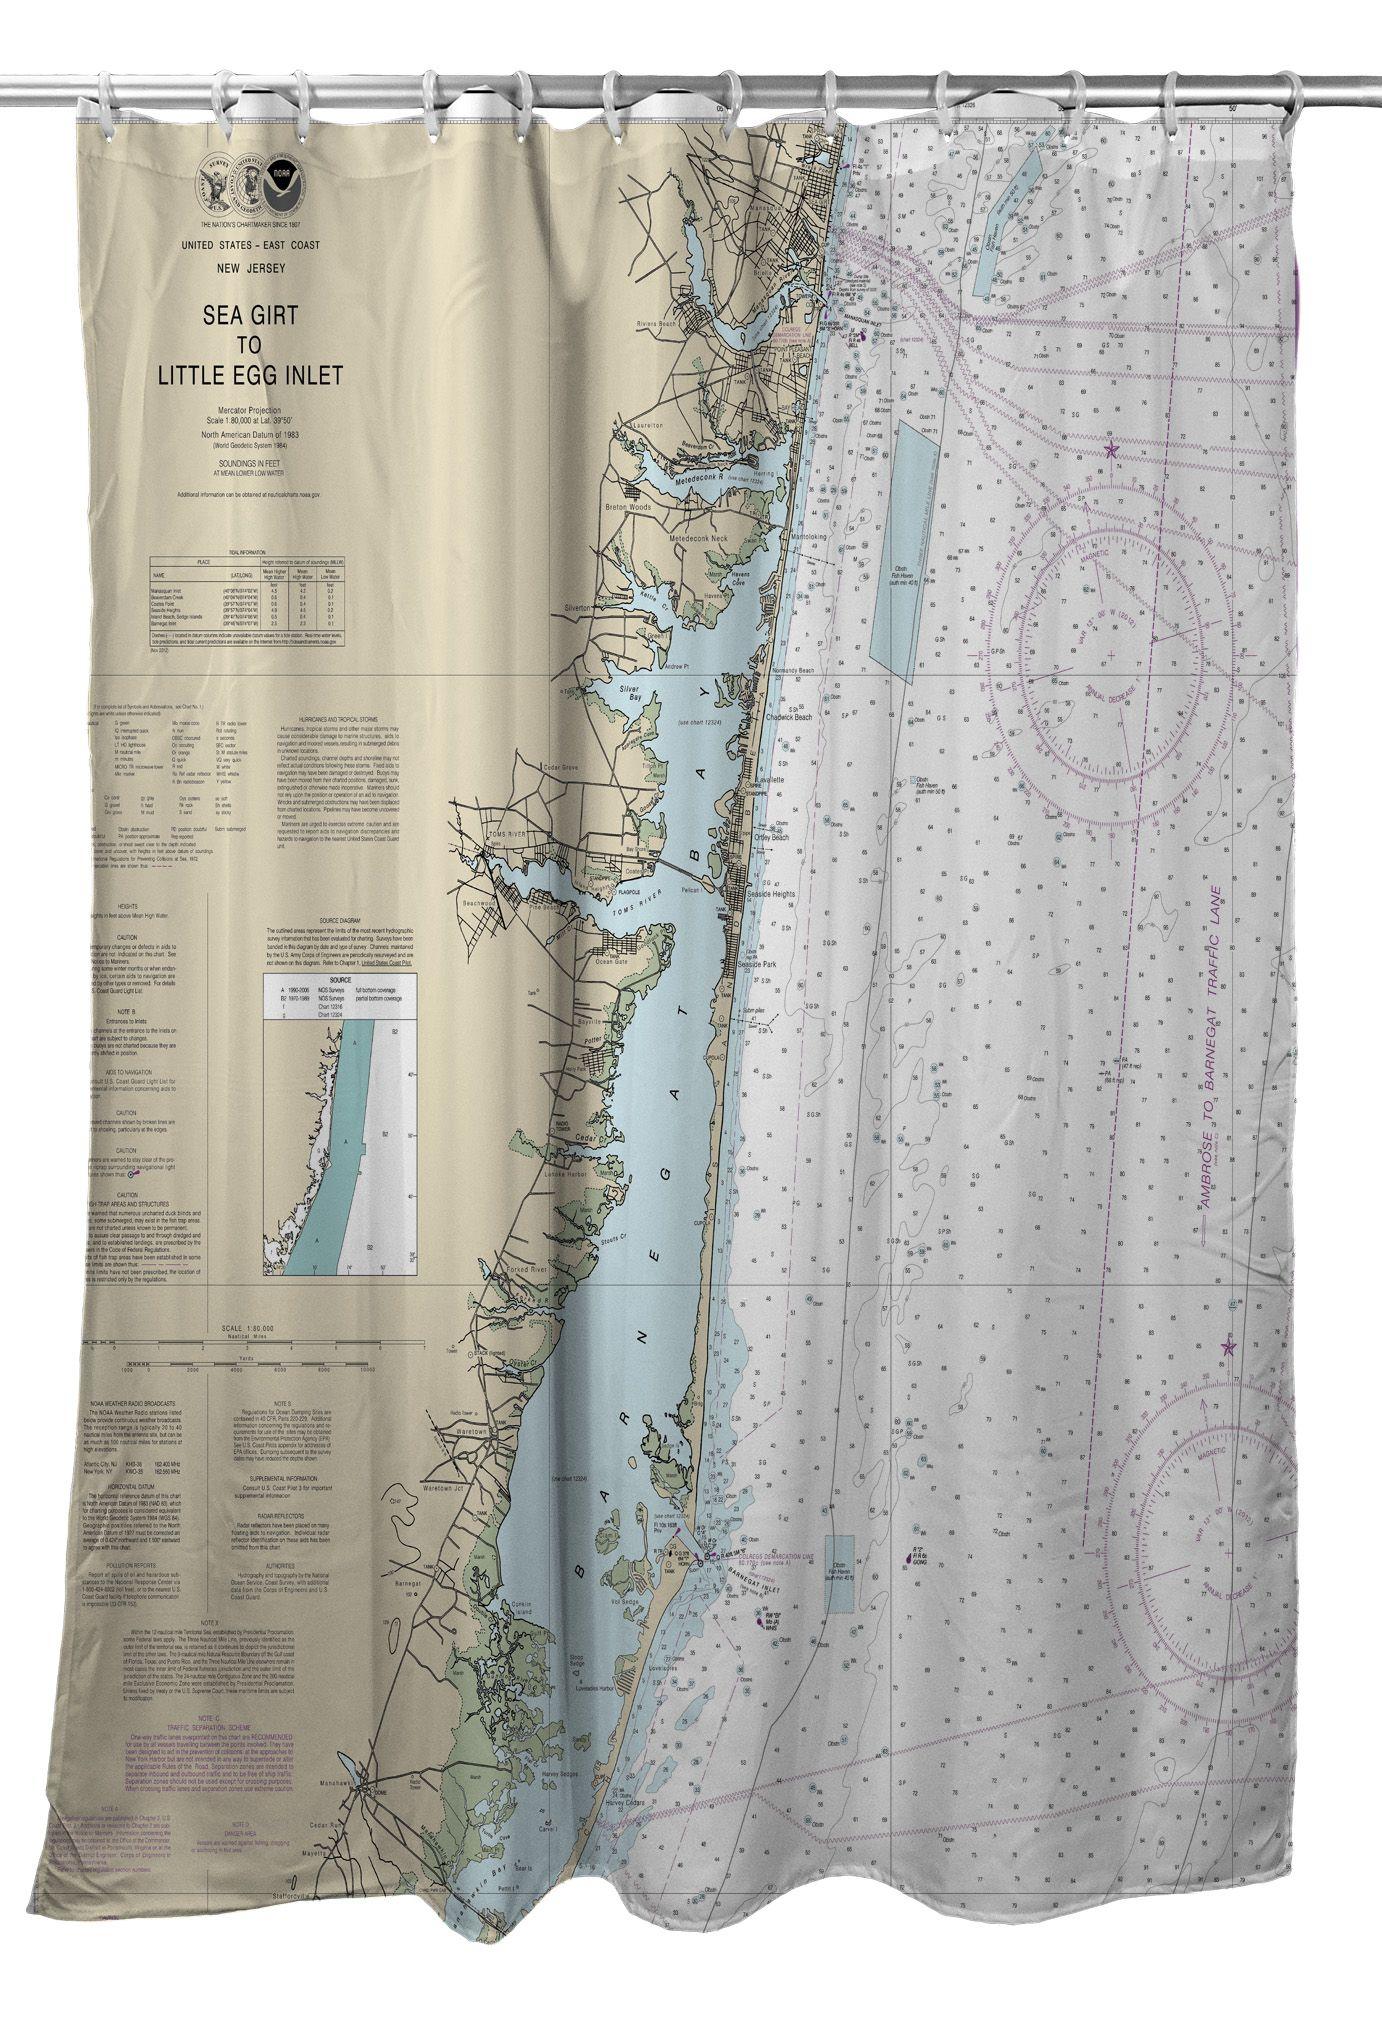 Nj Sea Girt To Barnegat Inlet Nj Nautical Chart Shower Curtain Sea Girt Curtains Nautical Chart